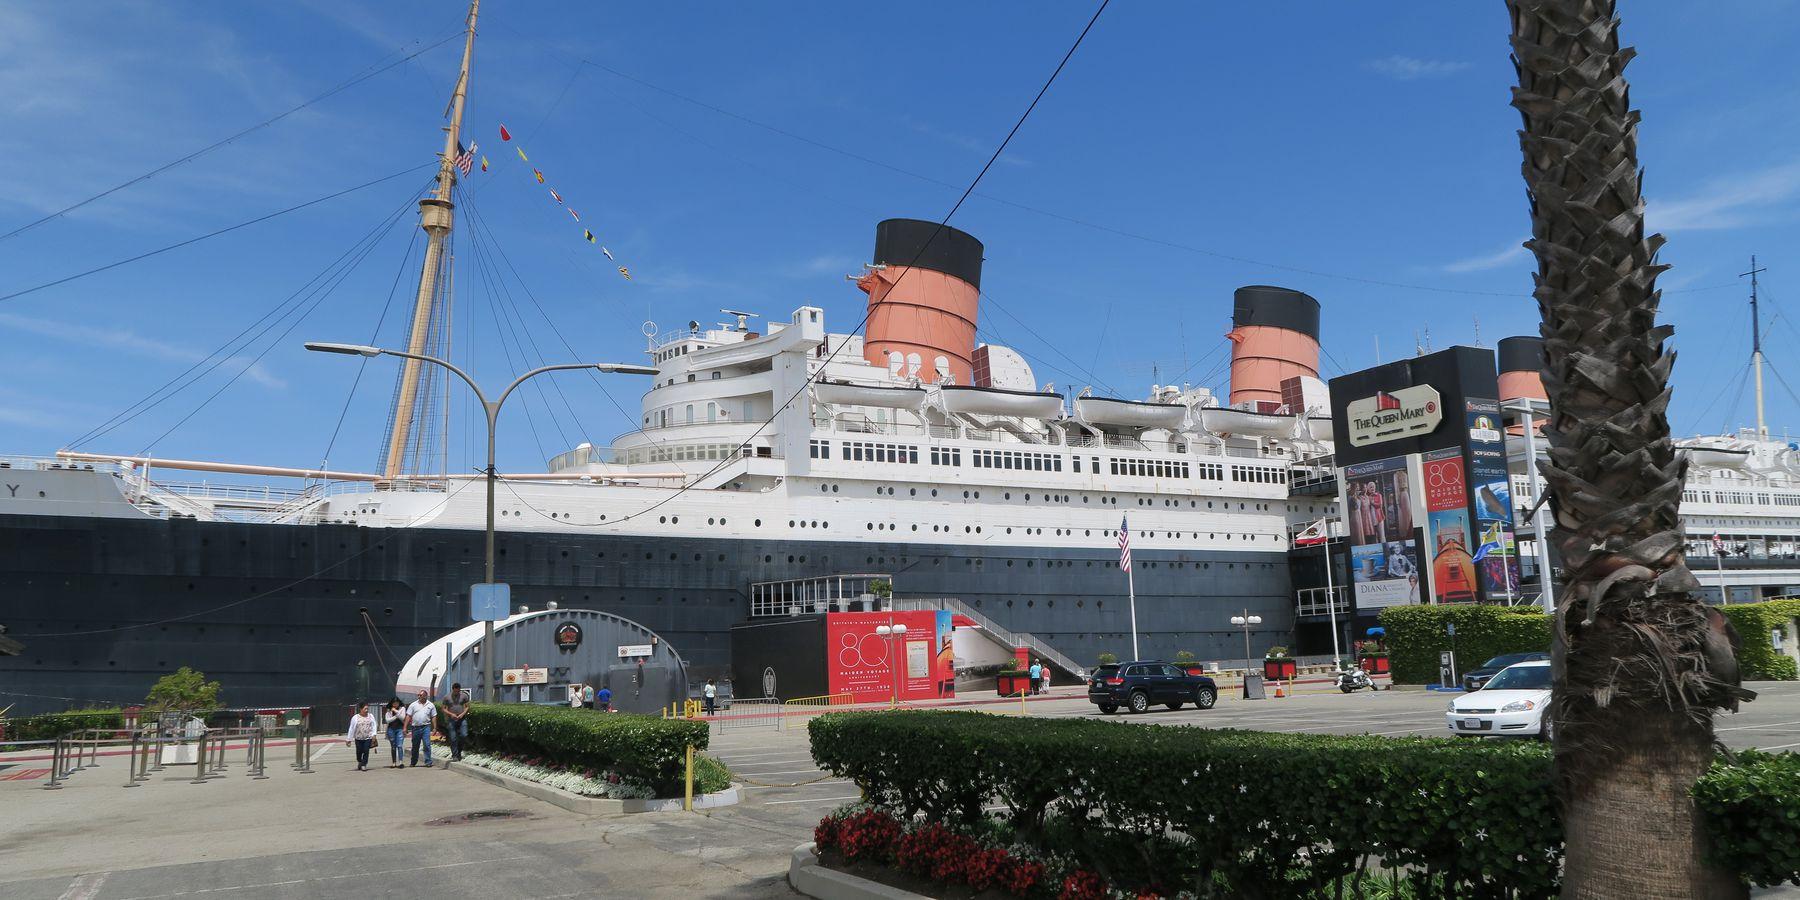 Queen Mary - Long Beach - Los Angeles - California - Amerika - Doets Reizen